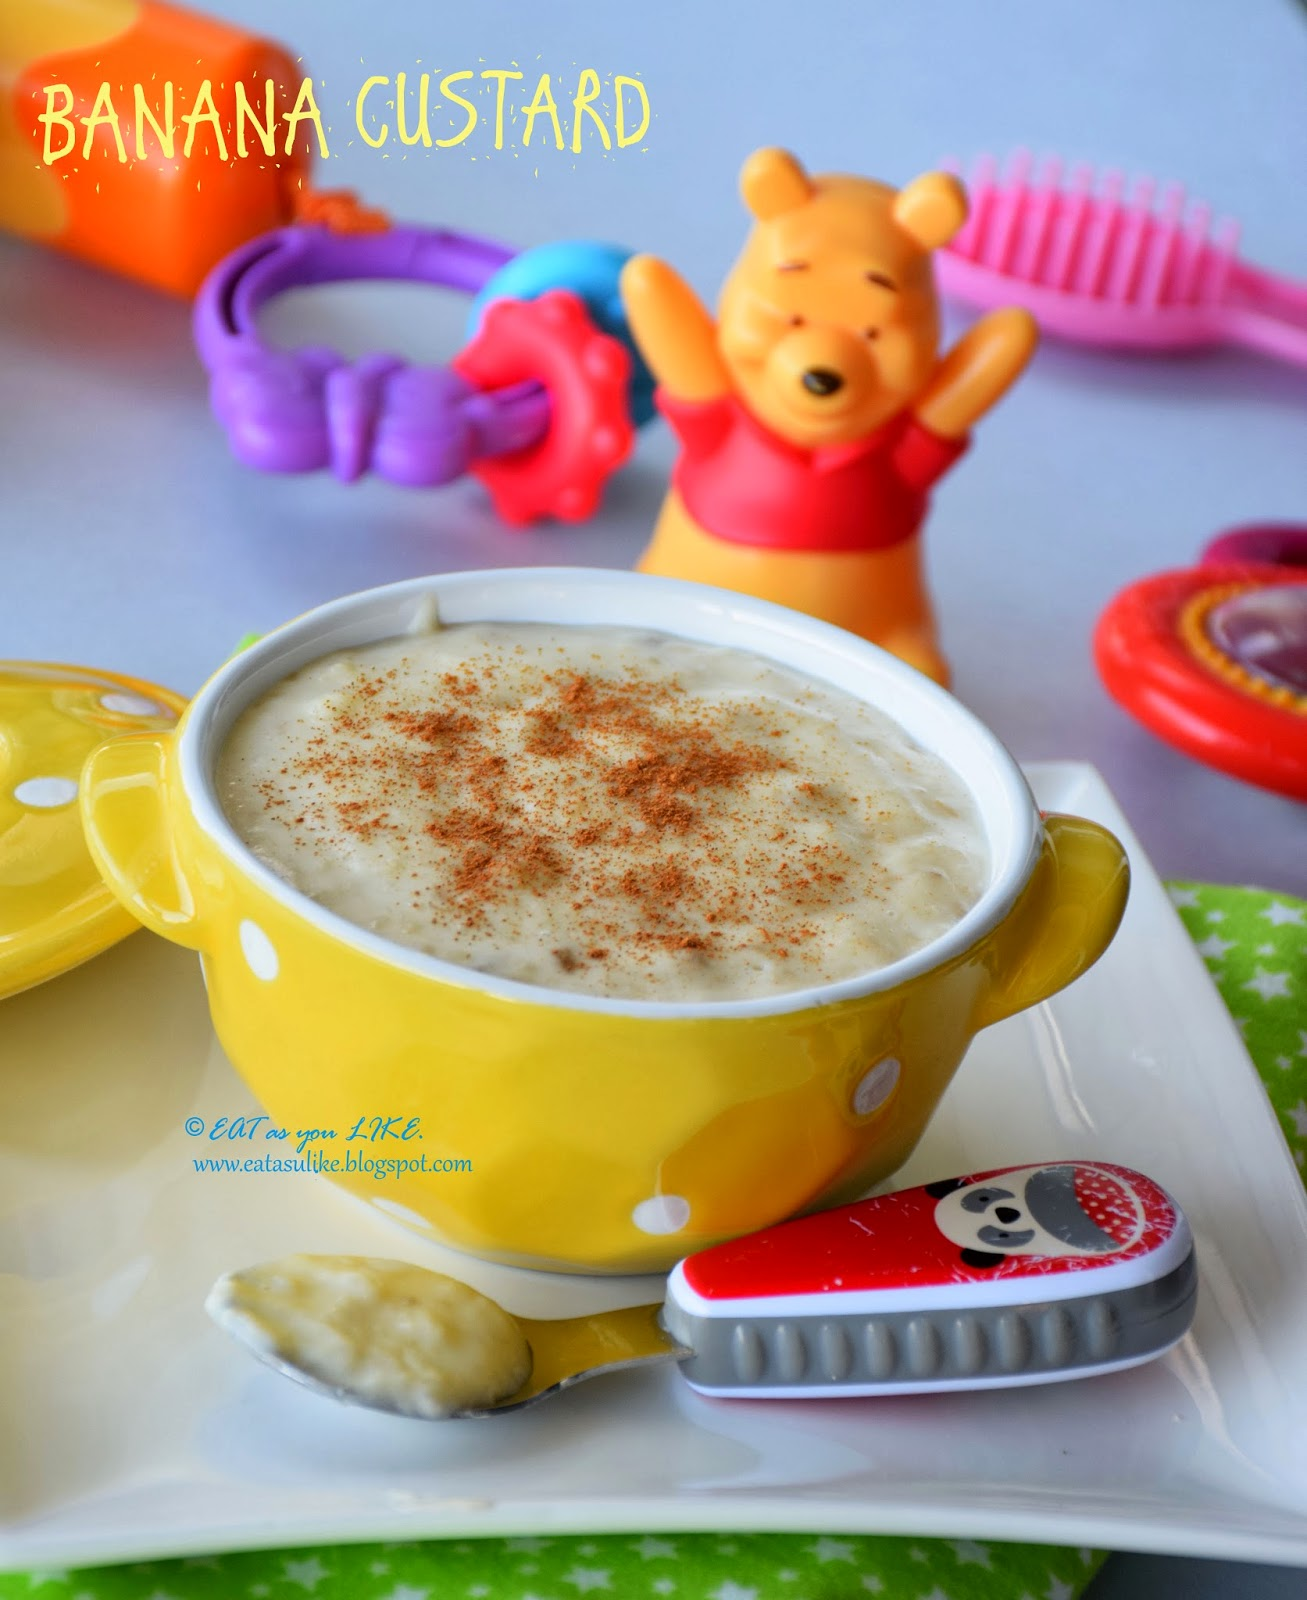 http://eatasulike.blogspot.com.au/2014/03/first-veggies-for-babies-6months.html